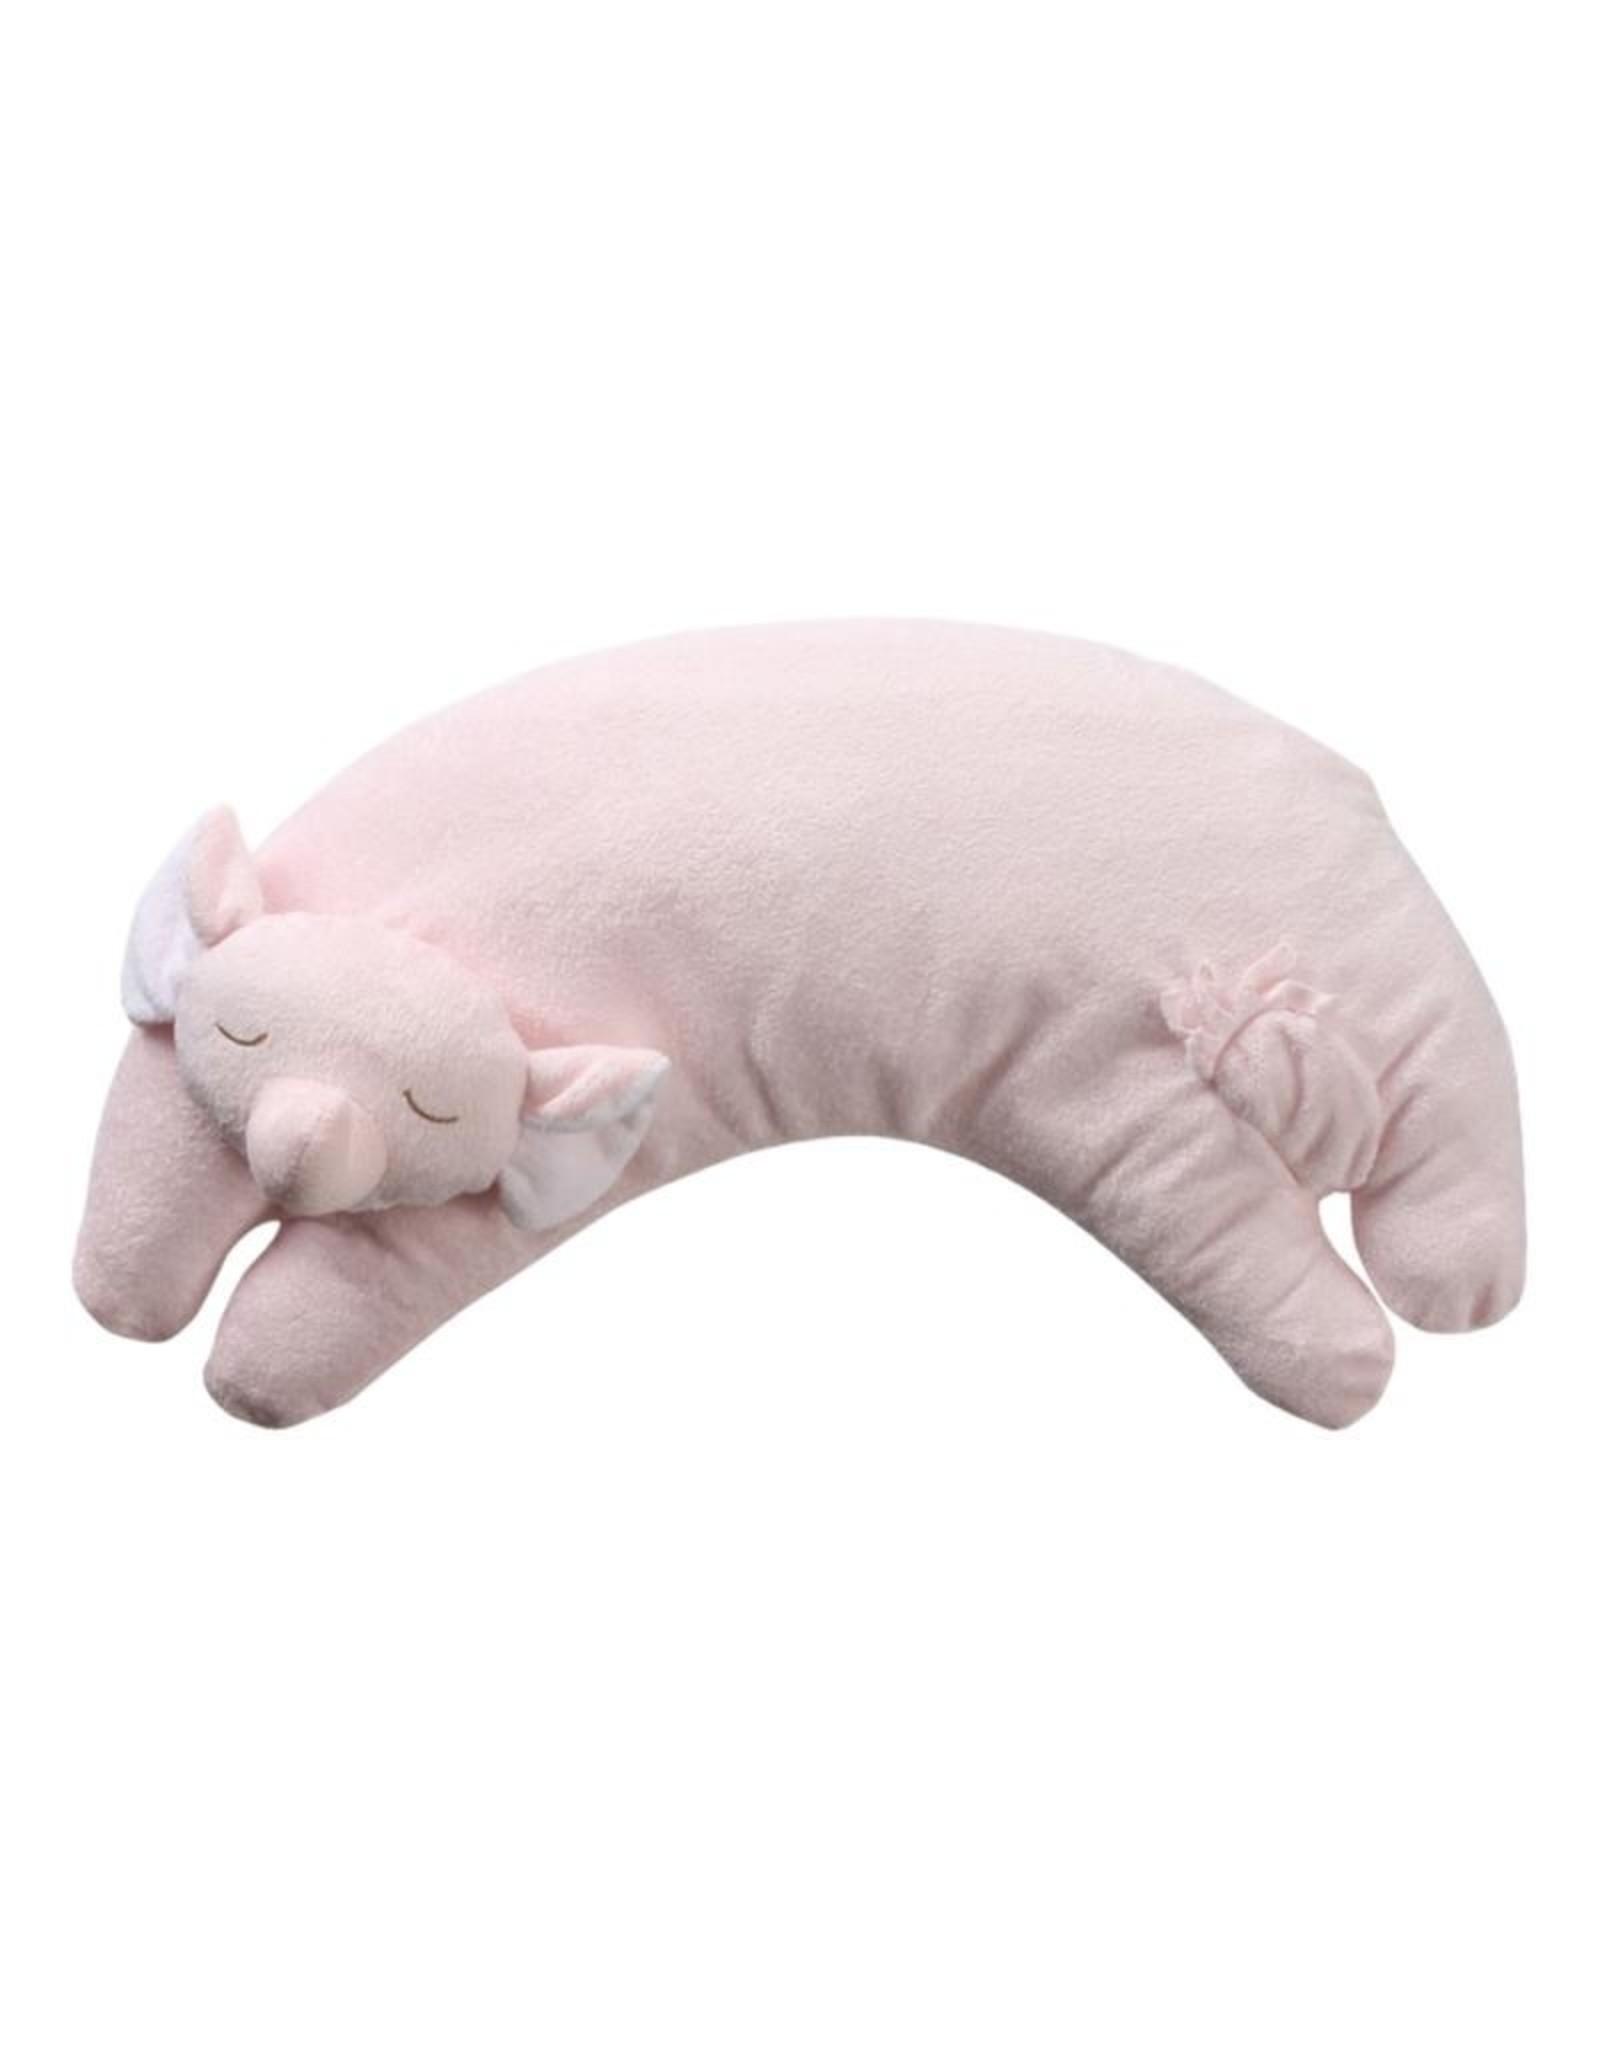 Angel Dear Curved Pillow Pink Elephant